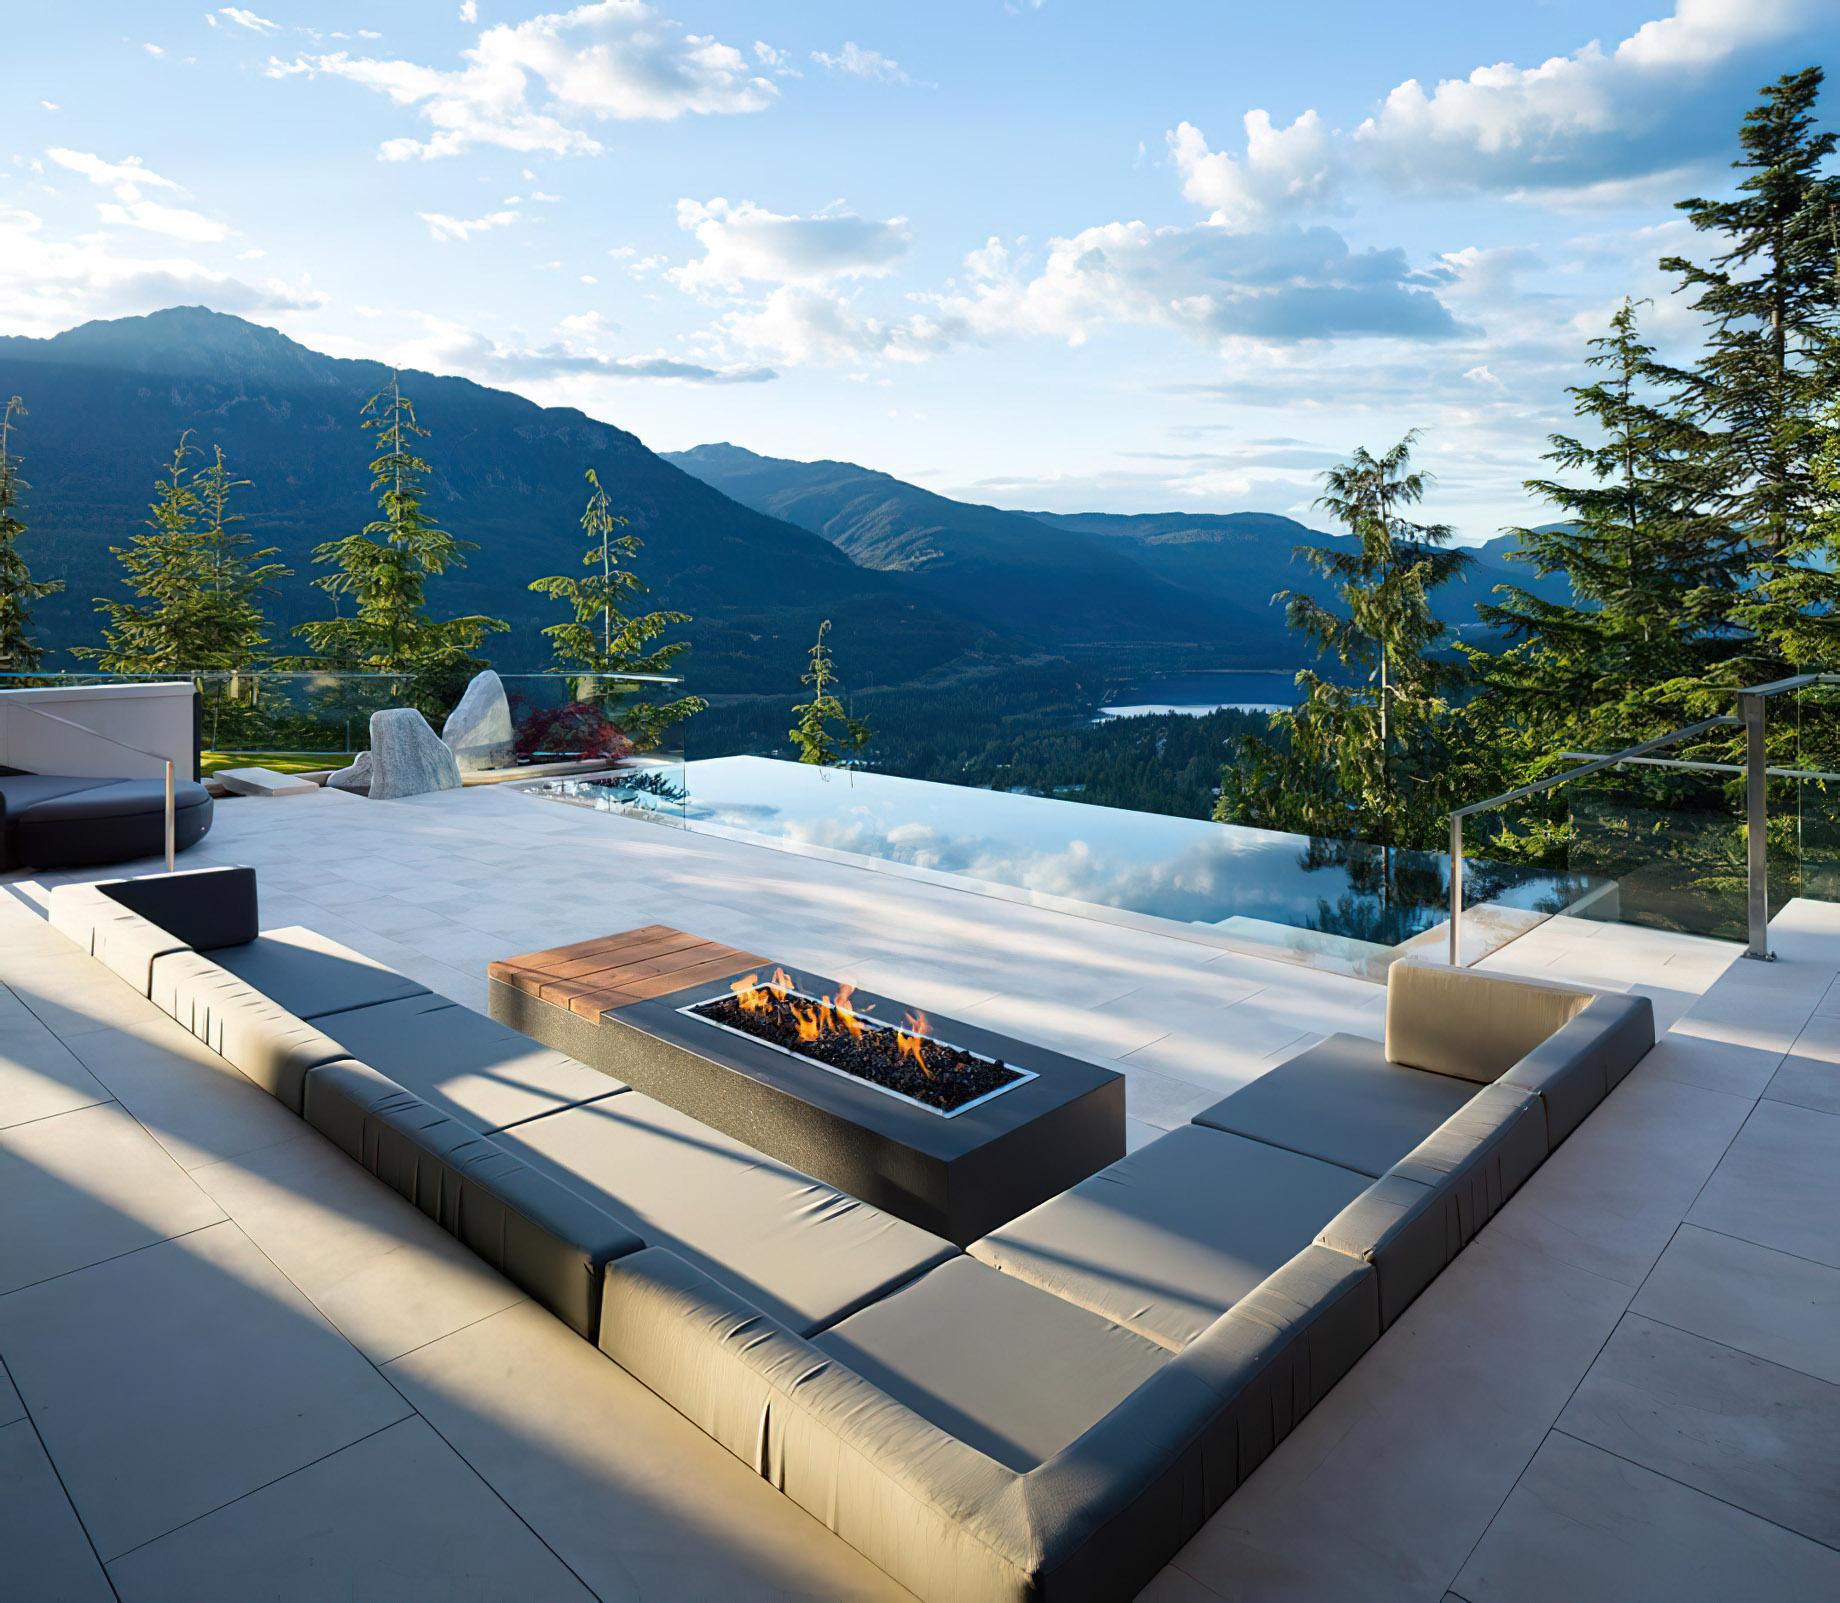 High Point Kadenwood Luxury Estate - High Point Dr, Whistler, BC, Canada